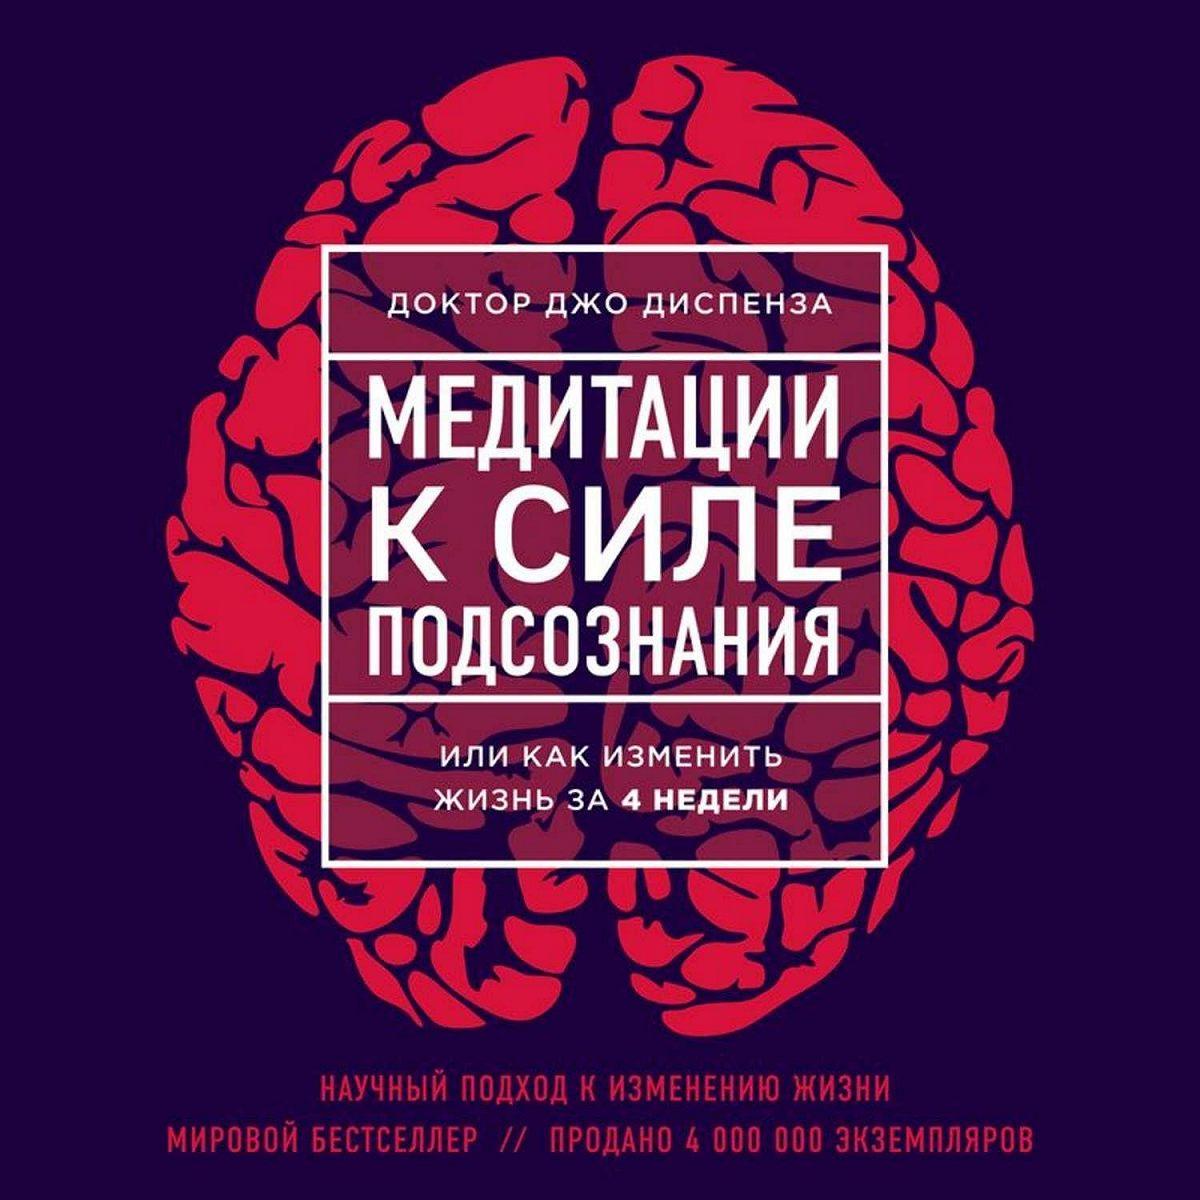 книга Медитации к силе подсознания